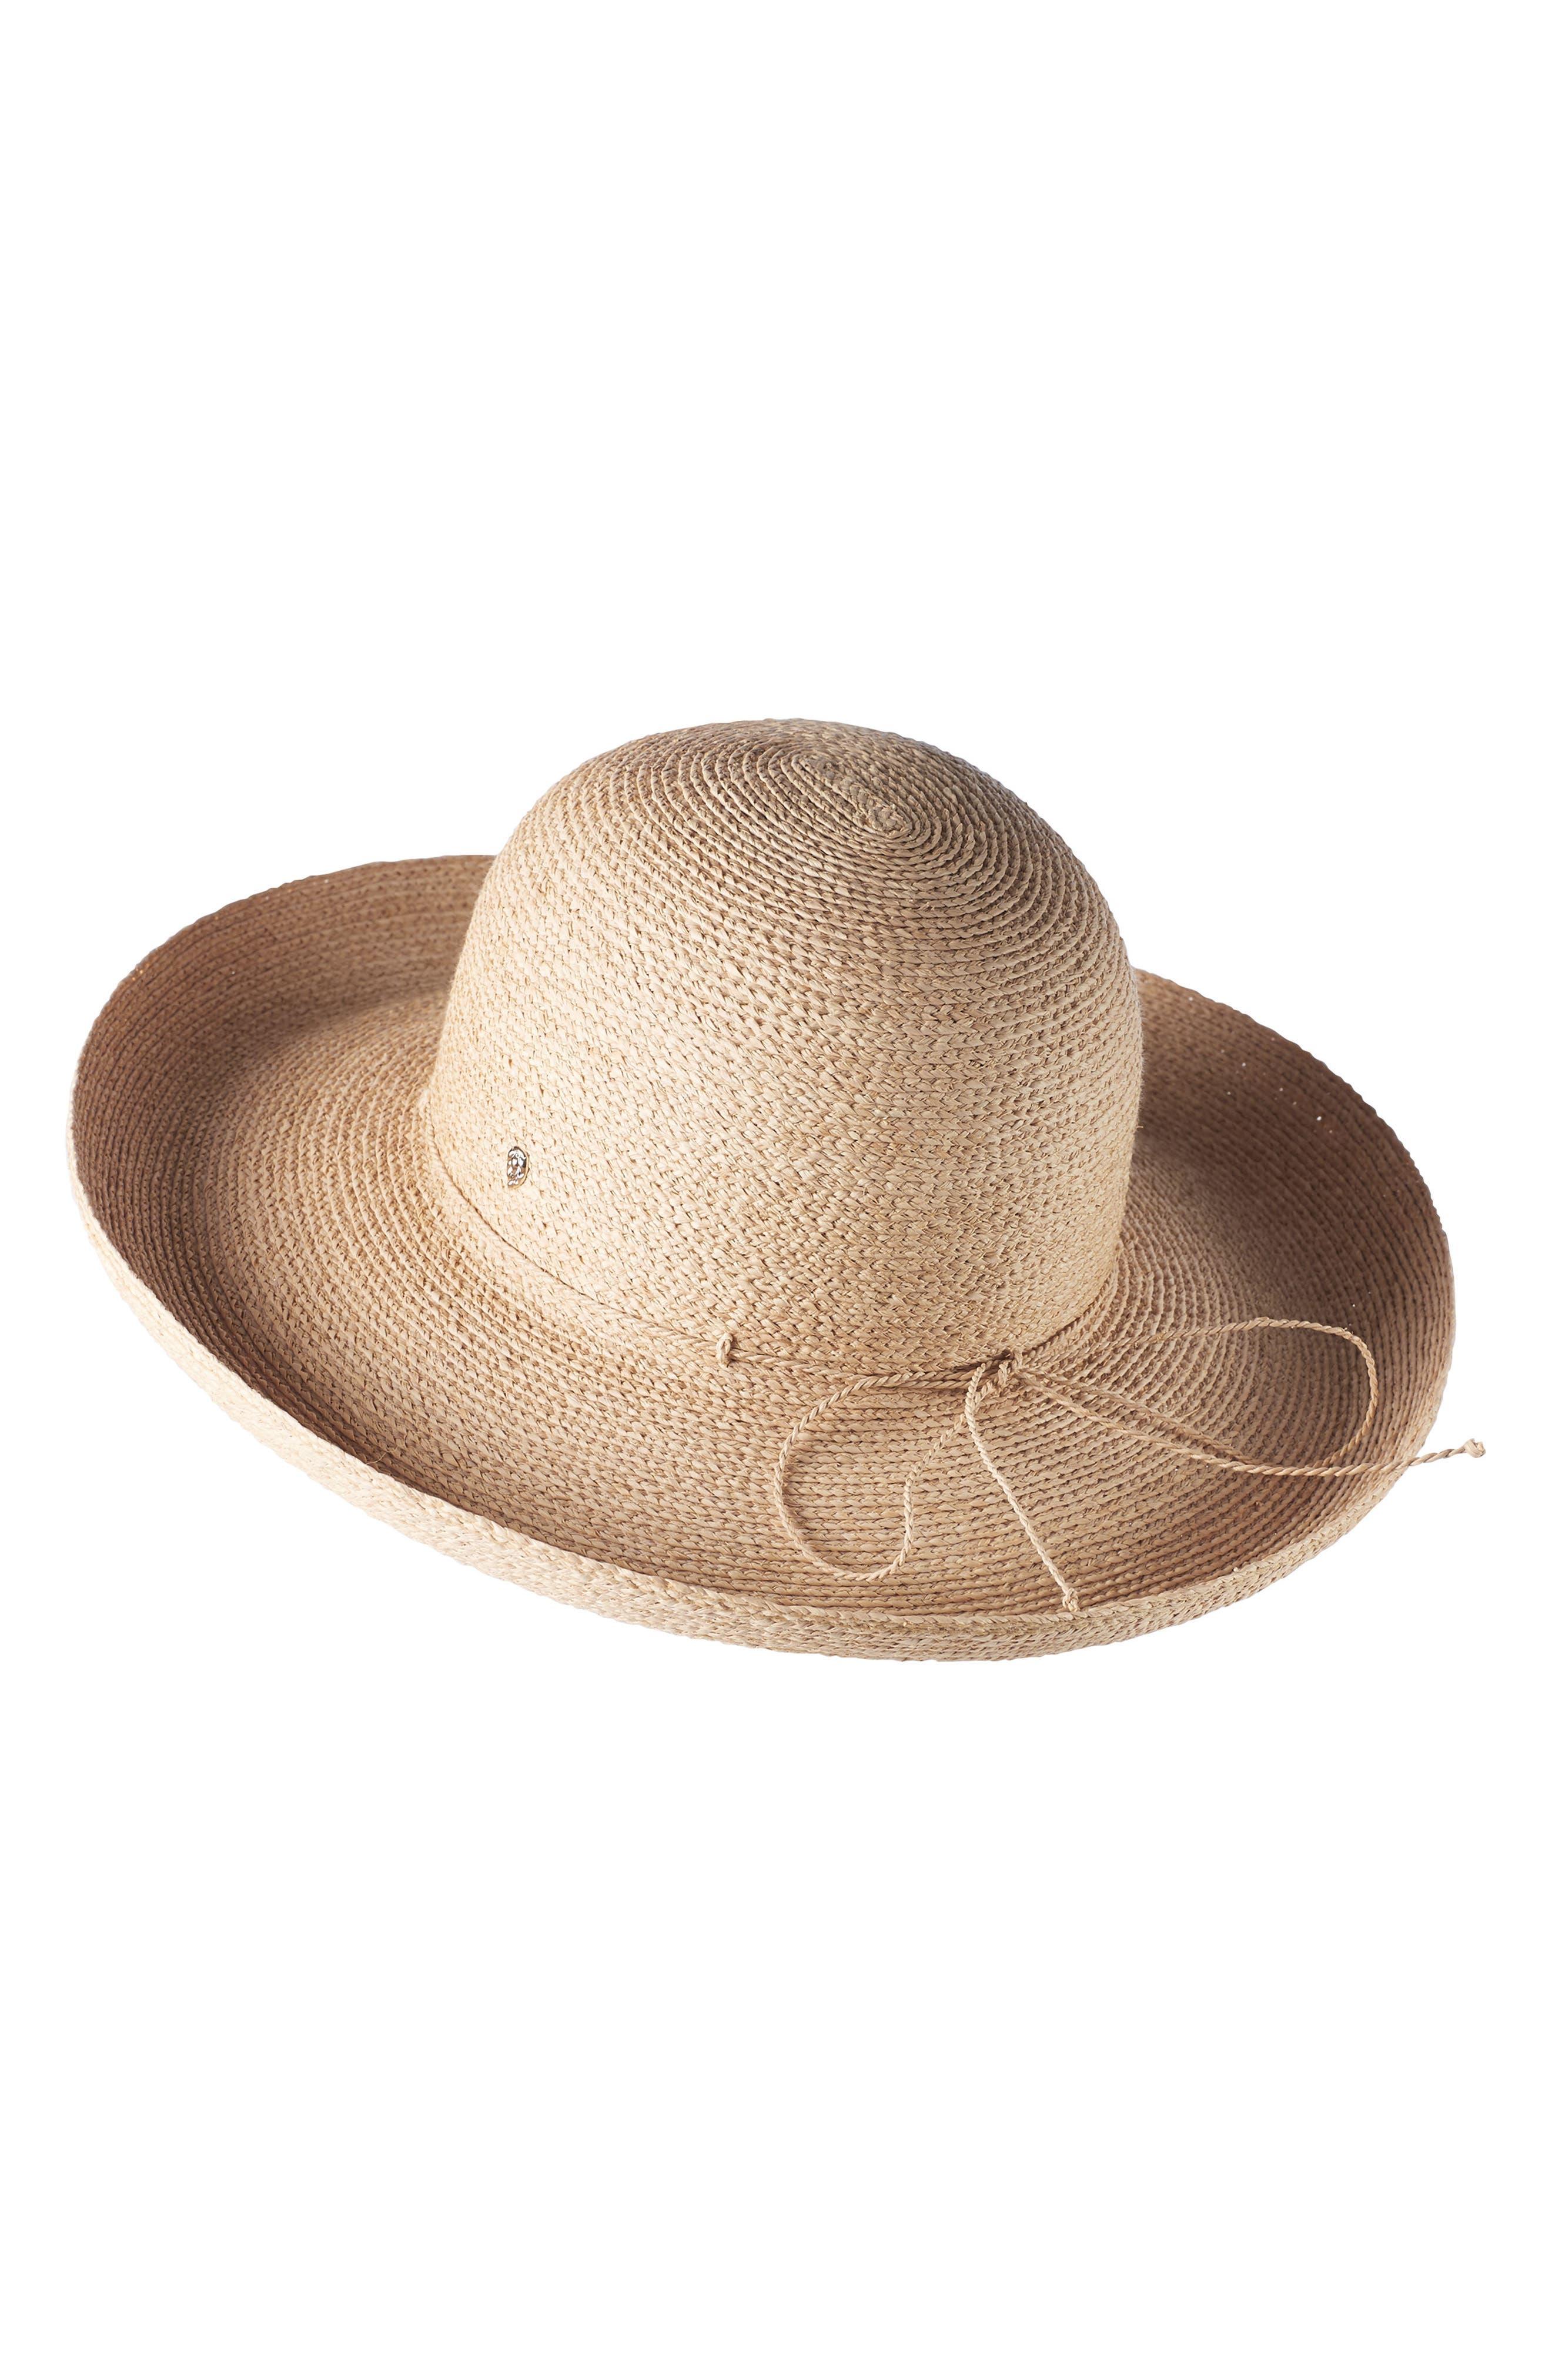 Rolled Brim Raffia Hat,                         Main,                         color, Natural